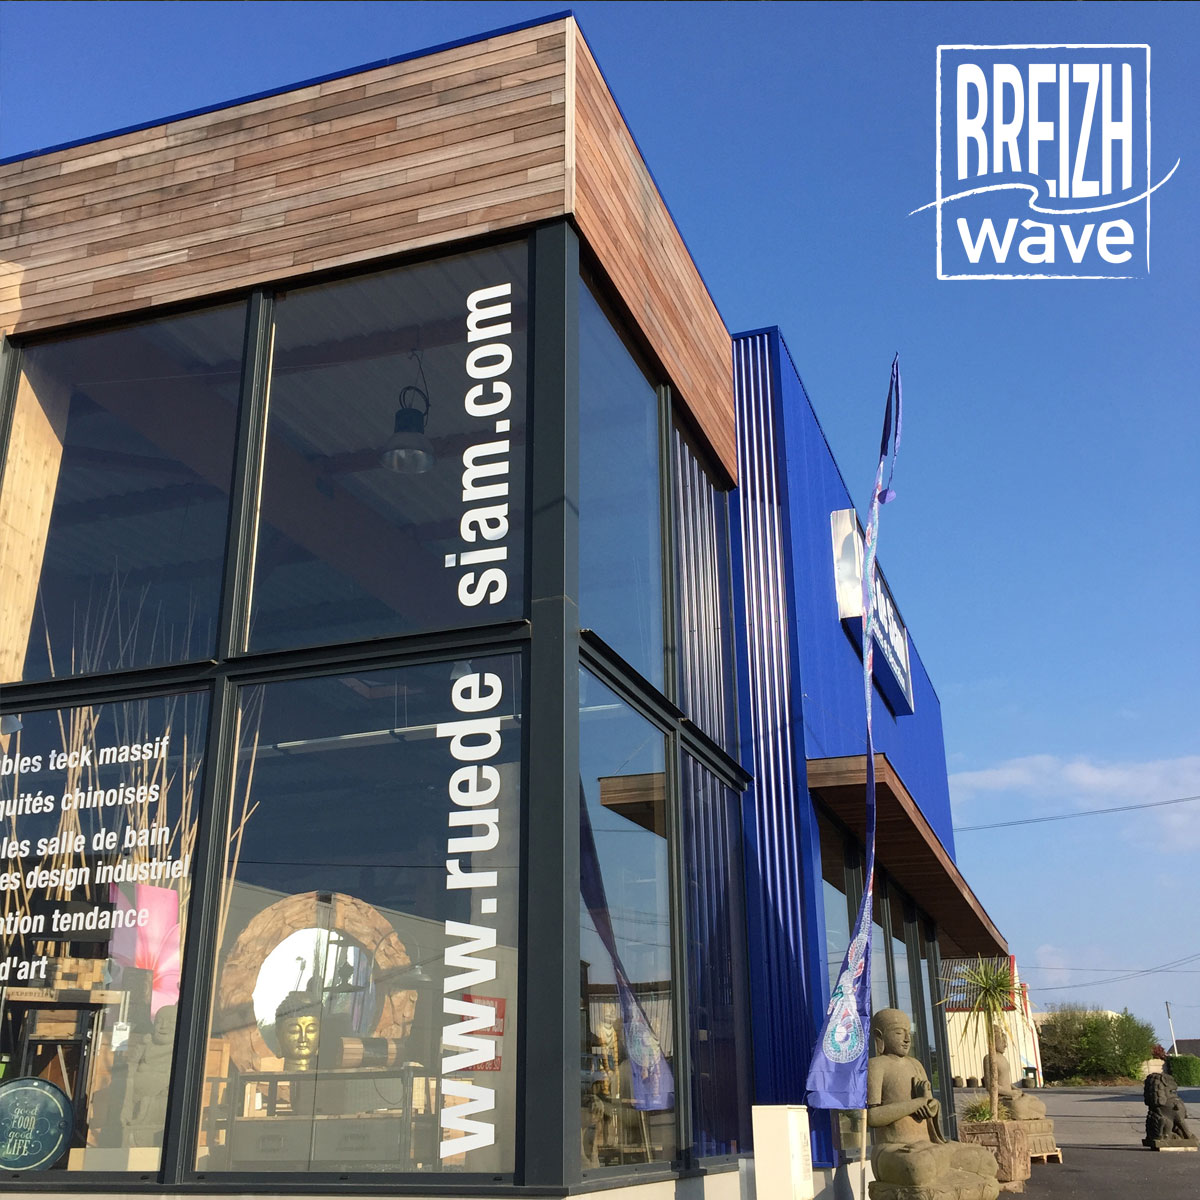 campagne de promotion magasin communication 2015 rue de siam meubles breizh wave. Black Bedroom Furniture Sets. Home Design Ideas